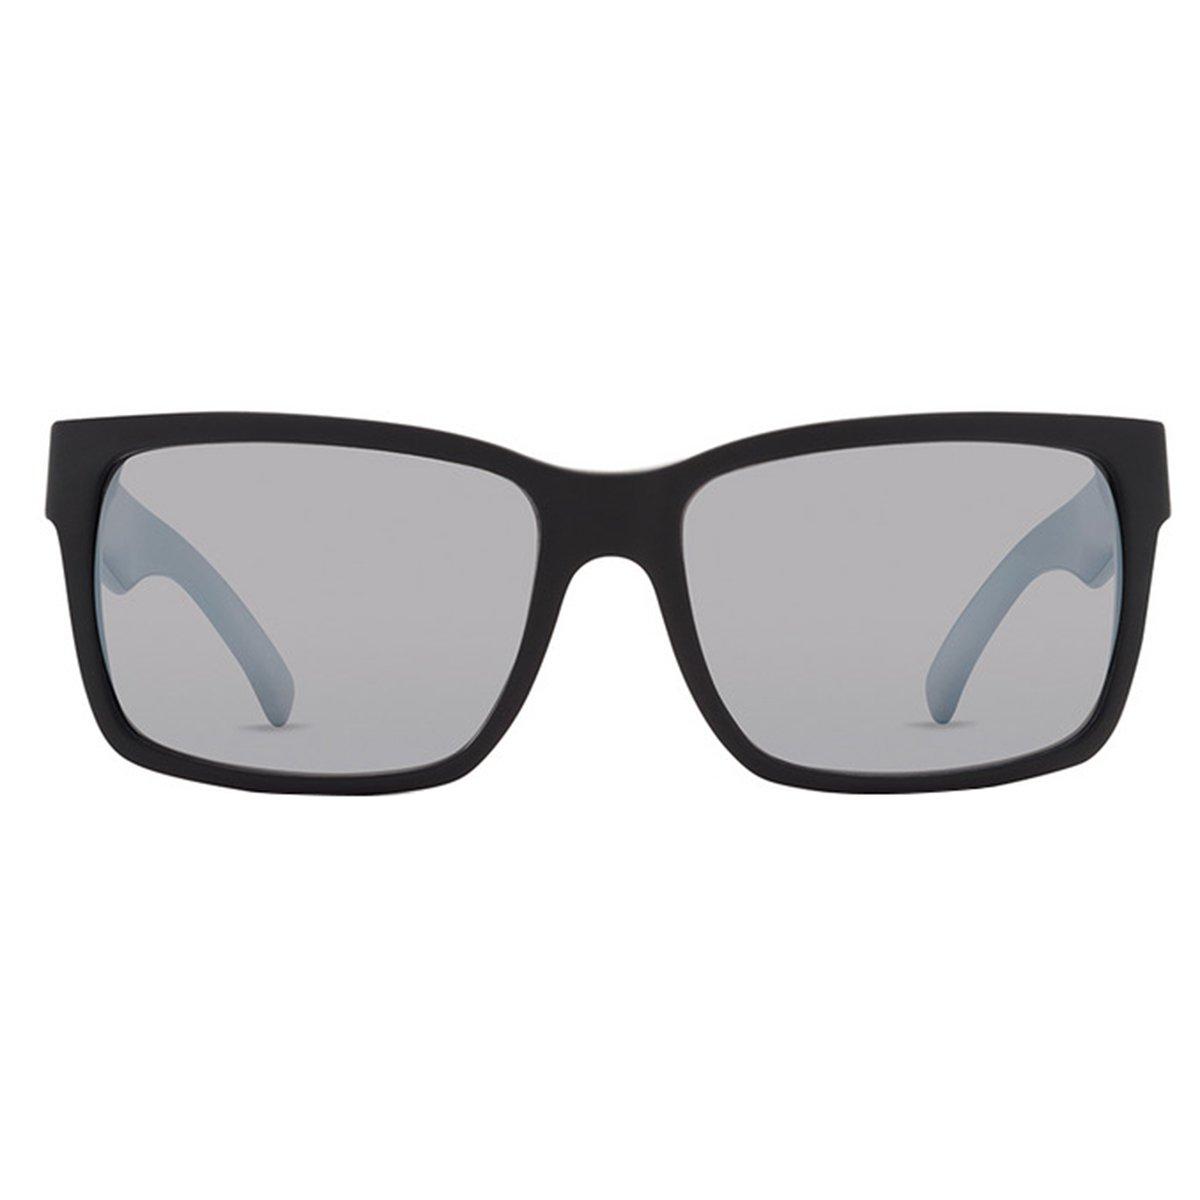 VonZipper Adults Elmore Sunglasses, Black Silver Lens One Size